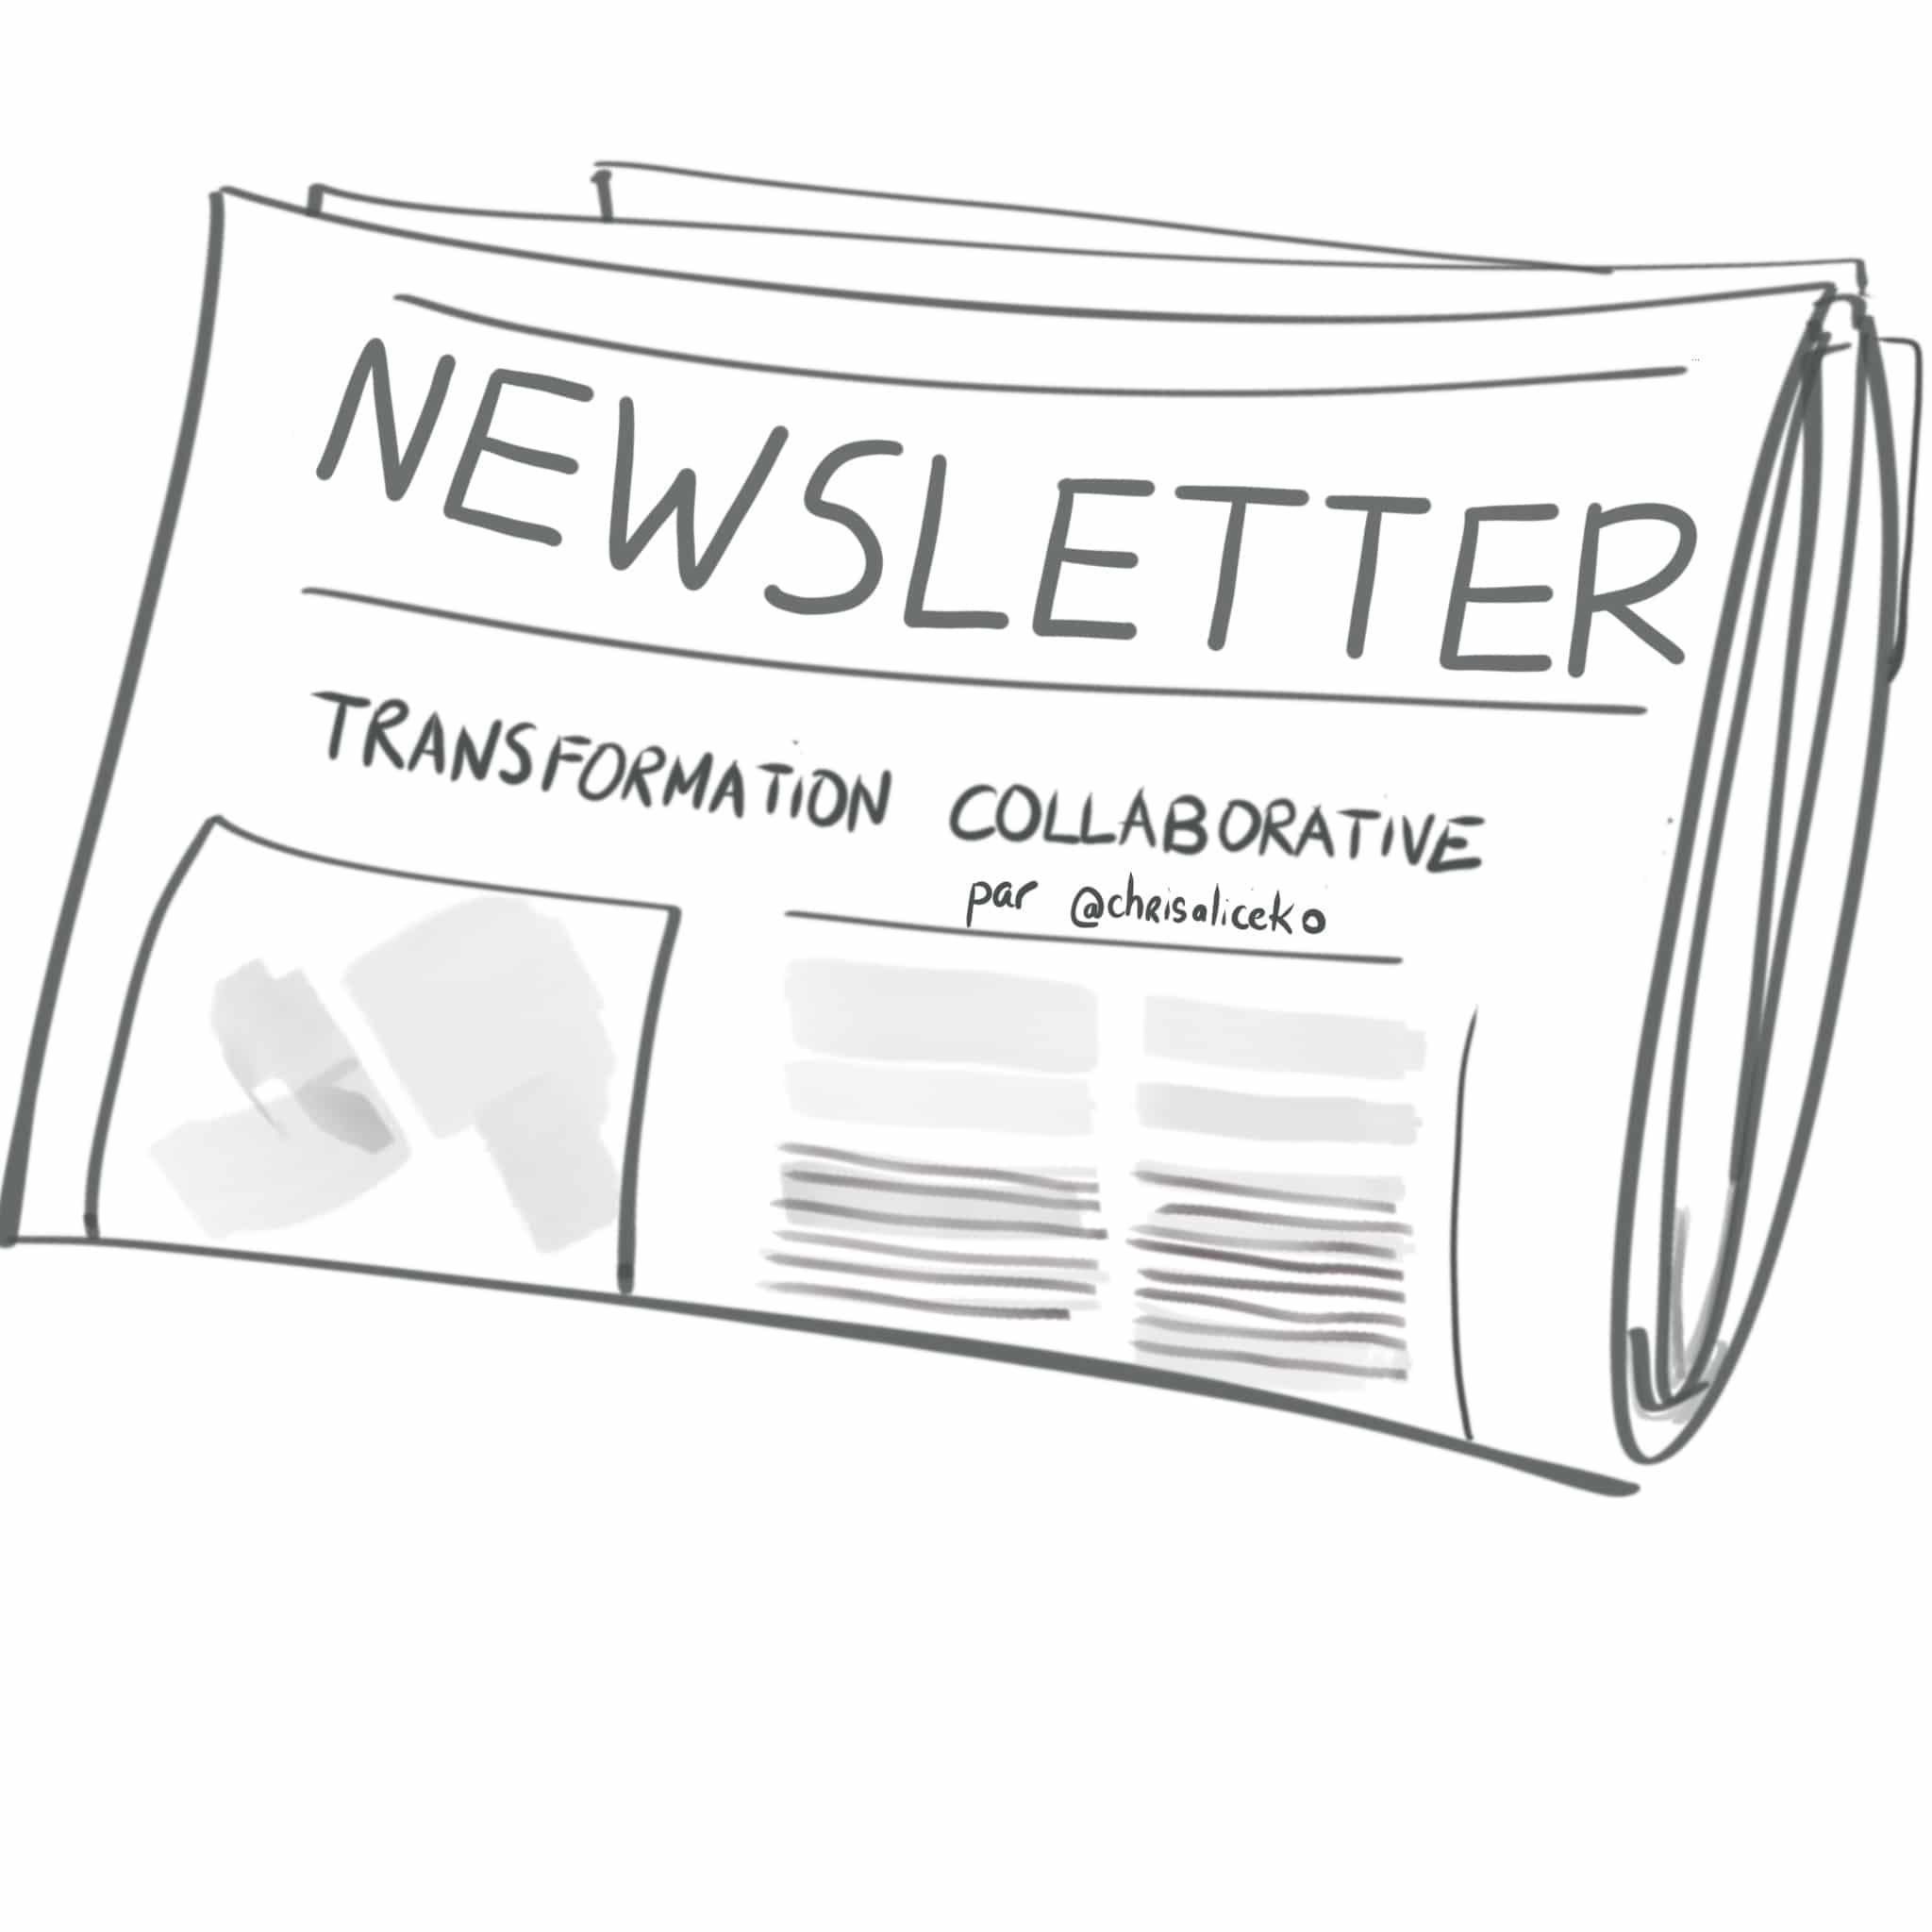 newsletter christine koehler